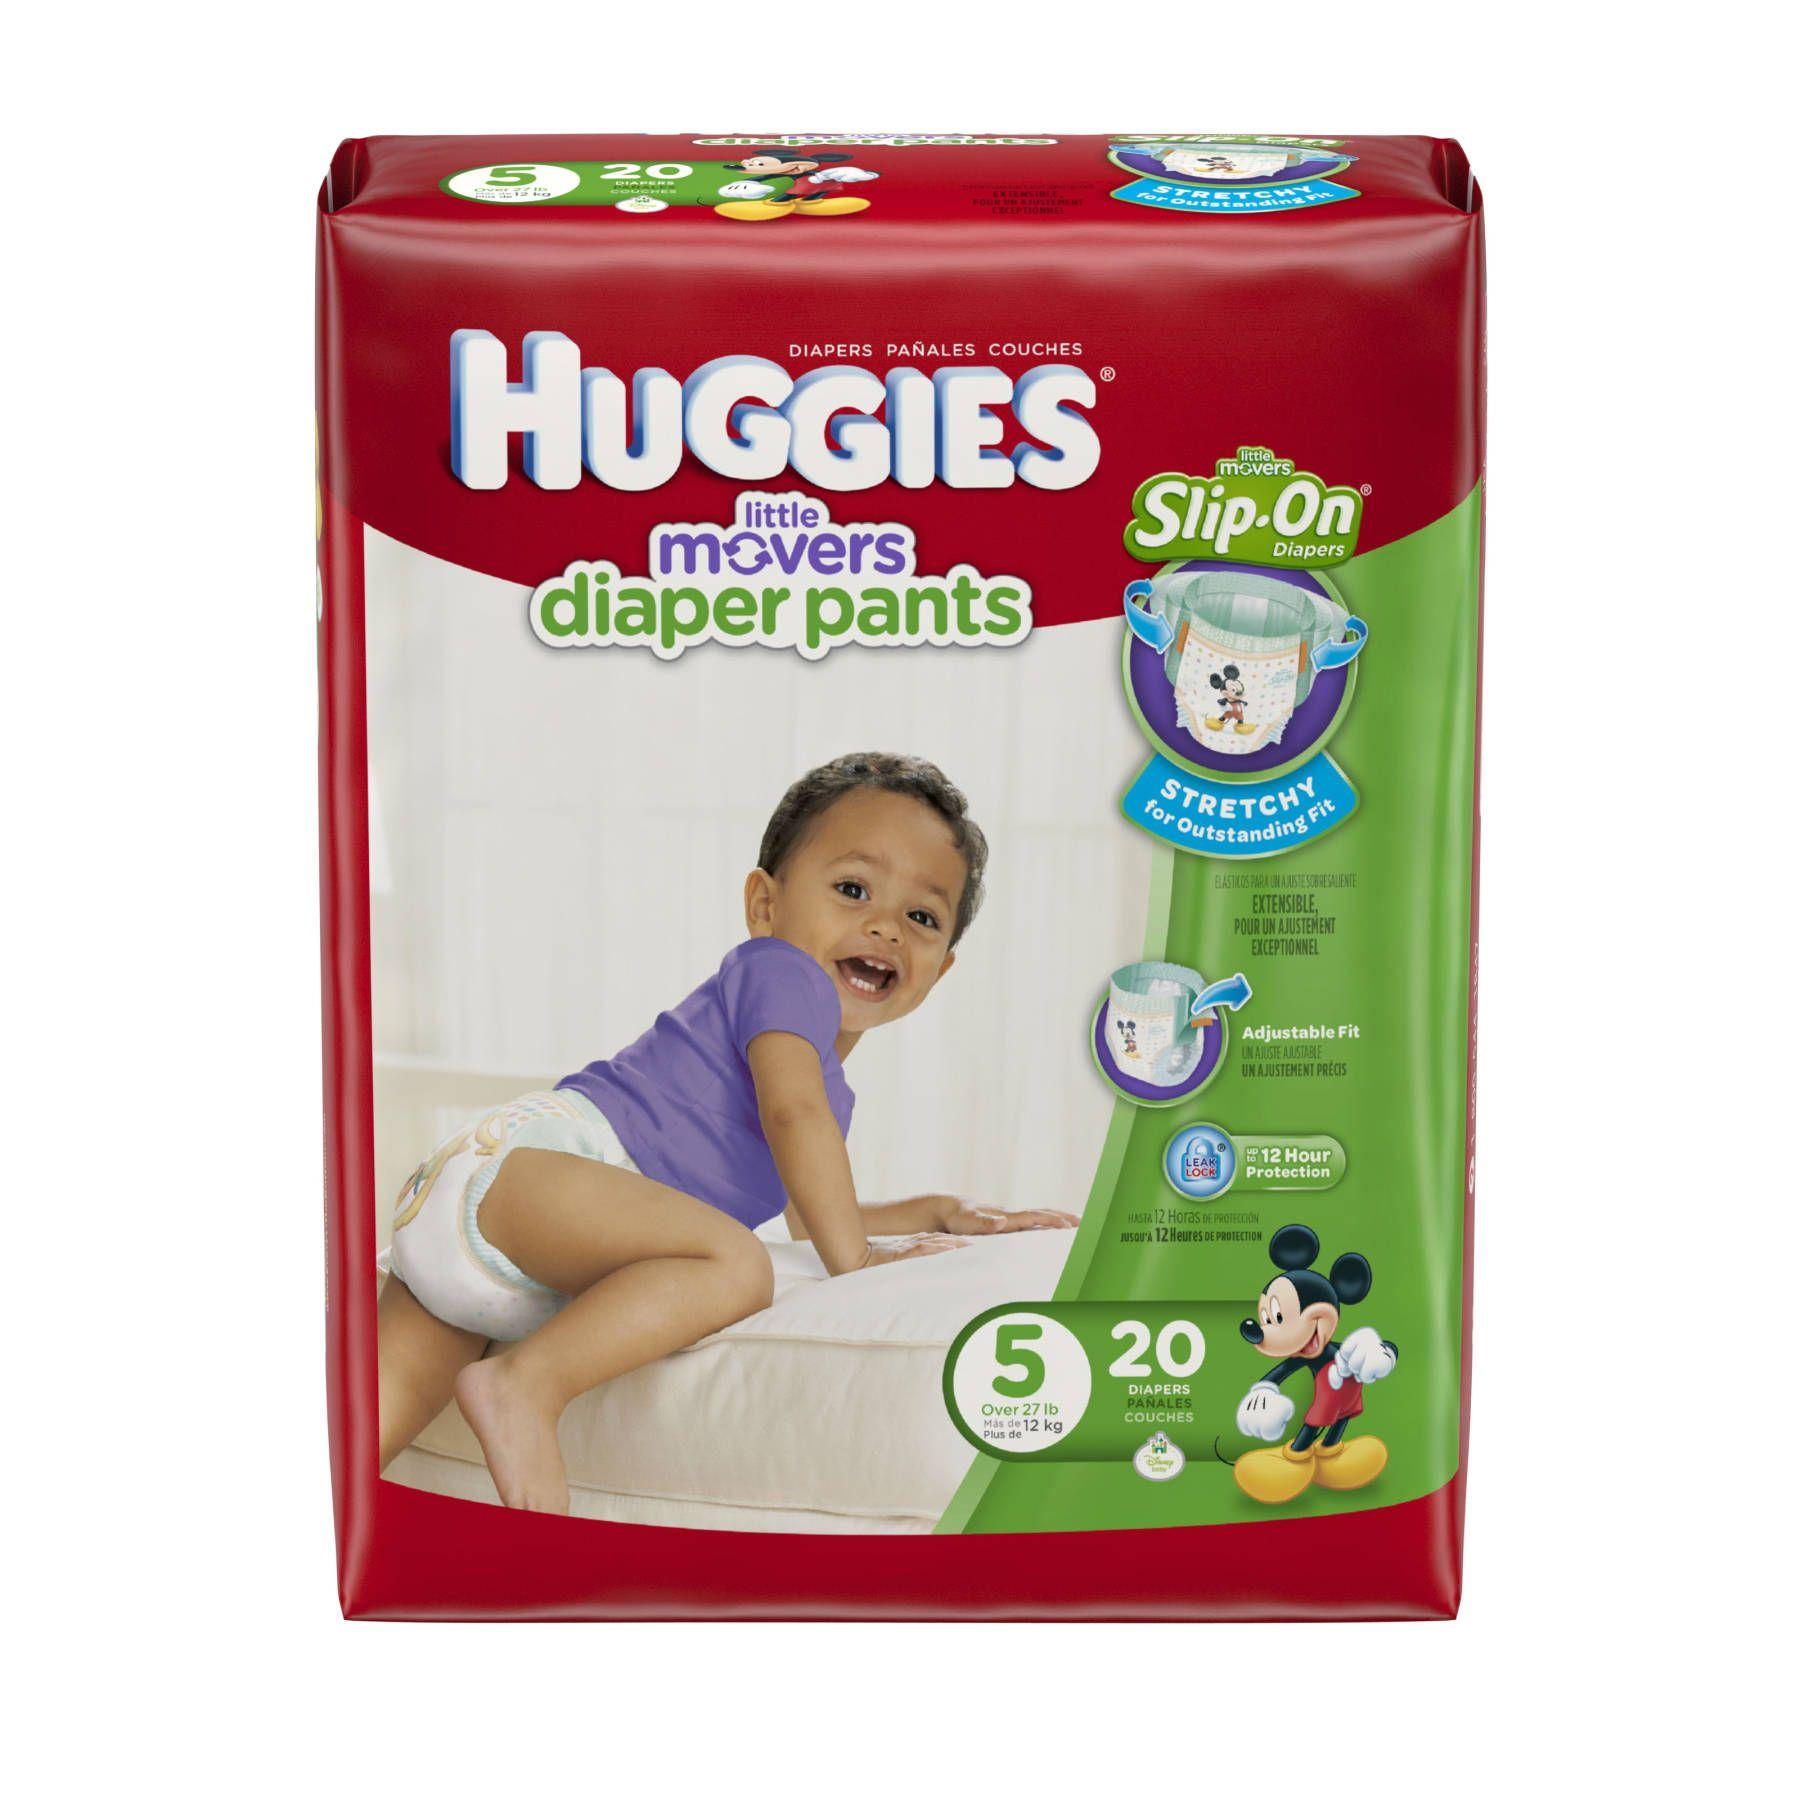 Huggies Little Movers Diaper Pants